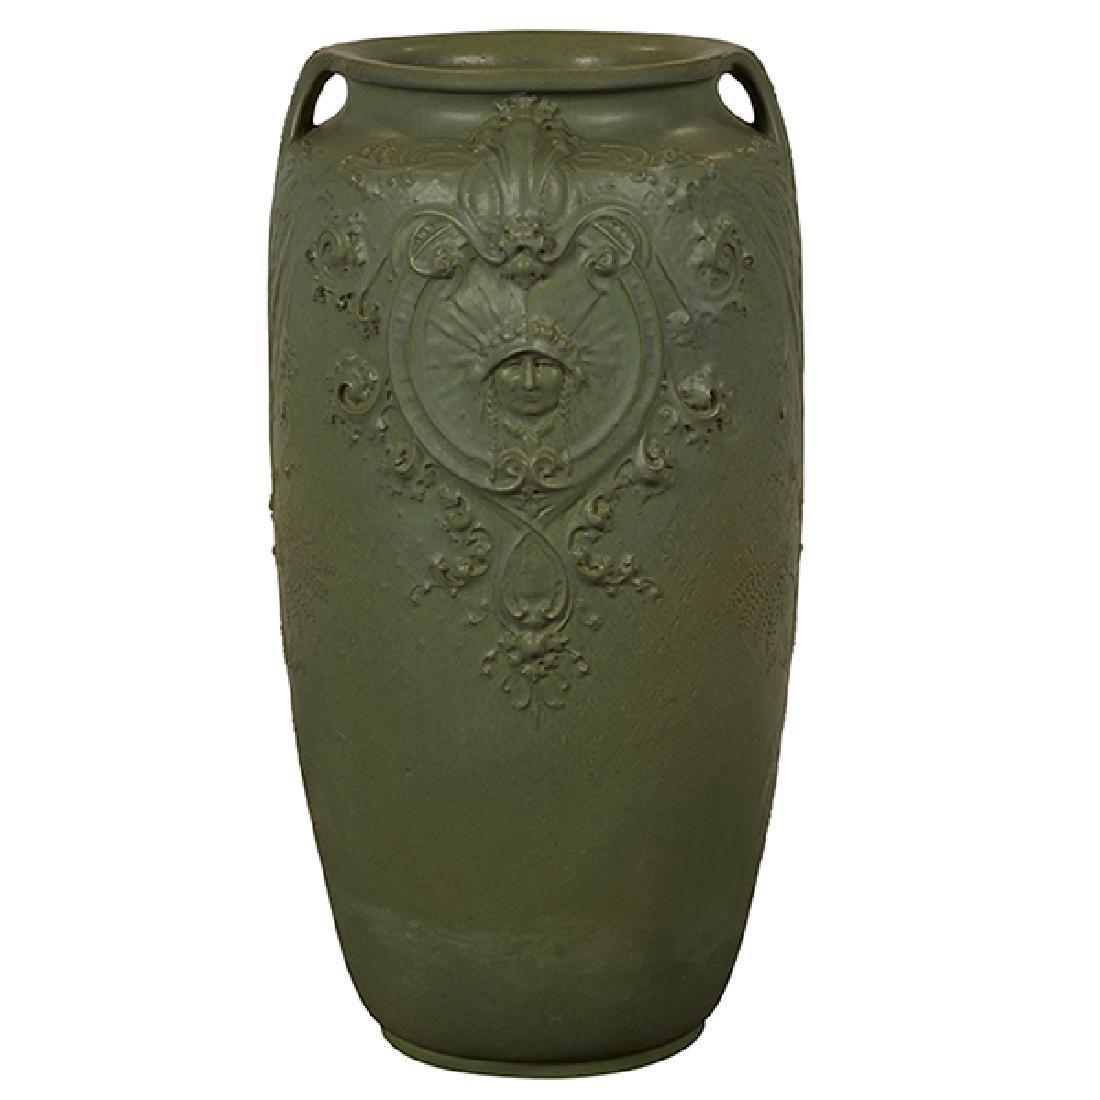 Teco, W.D. Gates (1852-1935), designer monumental vase